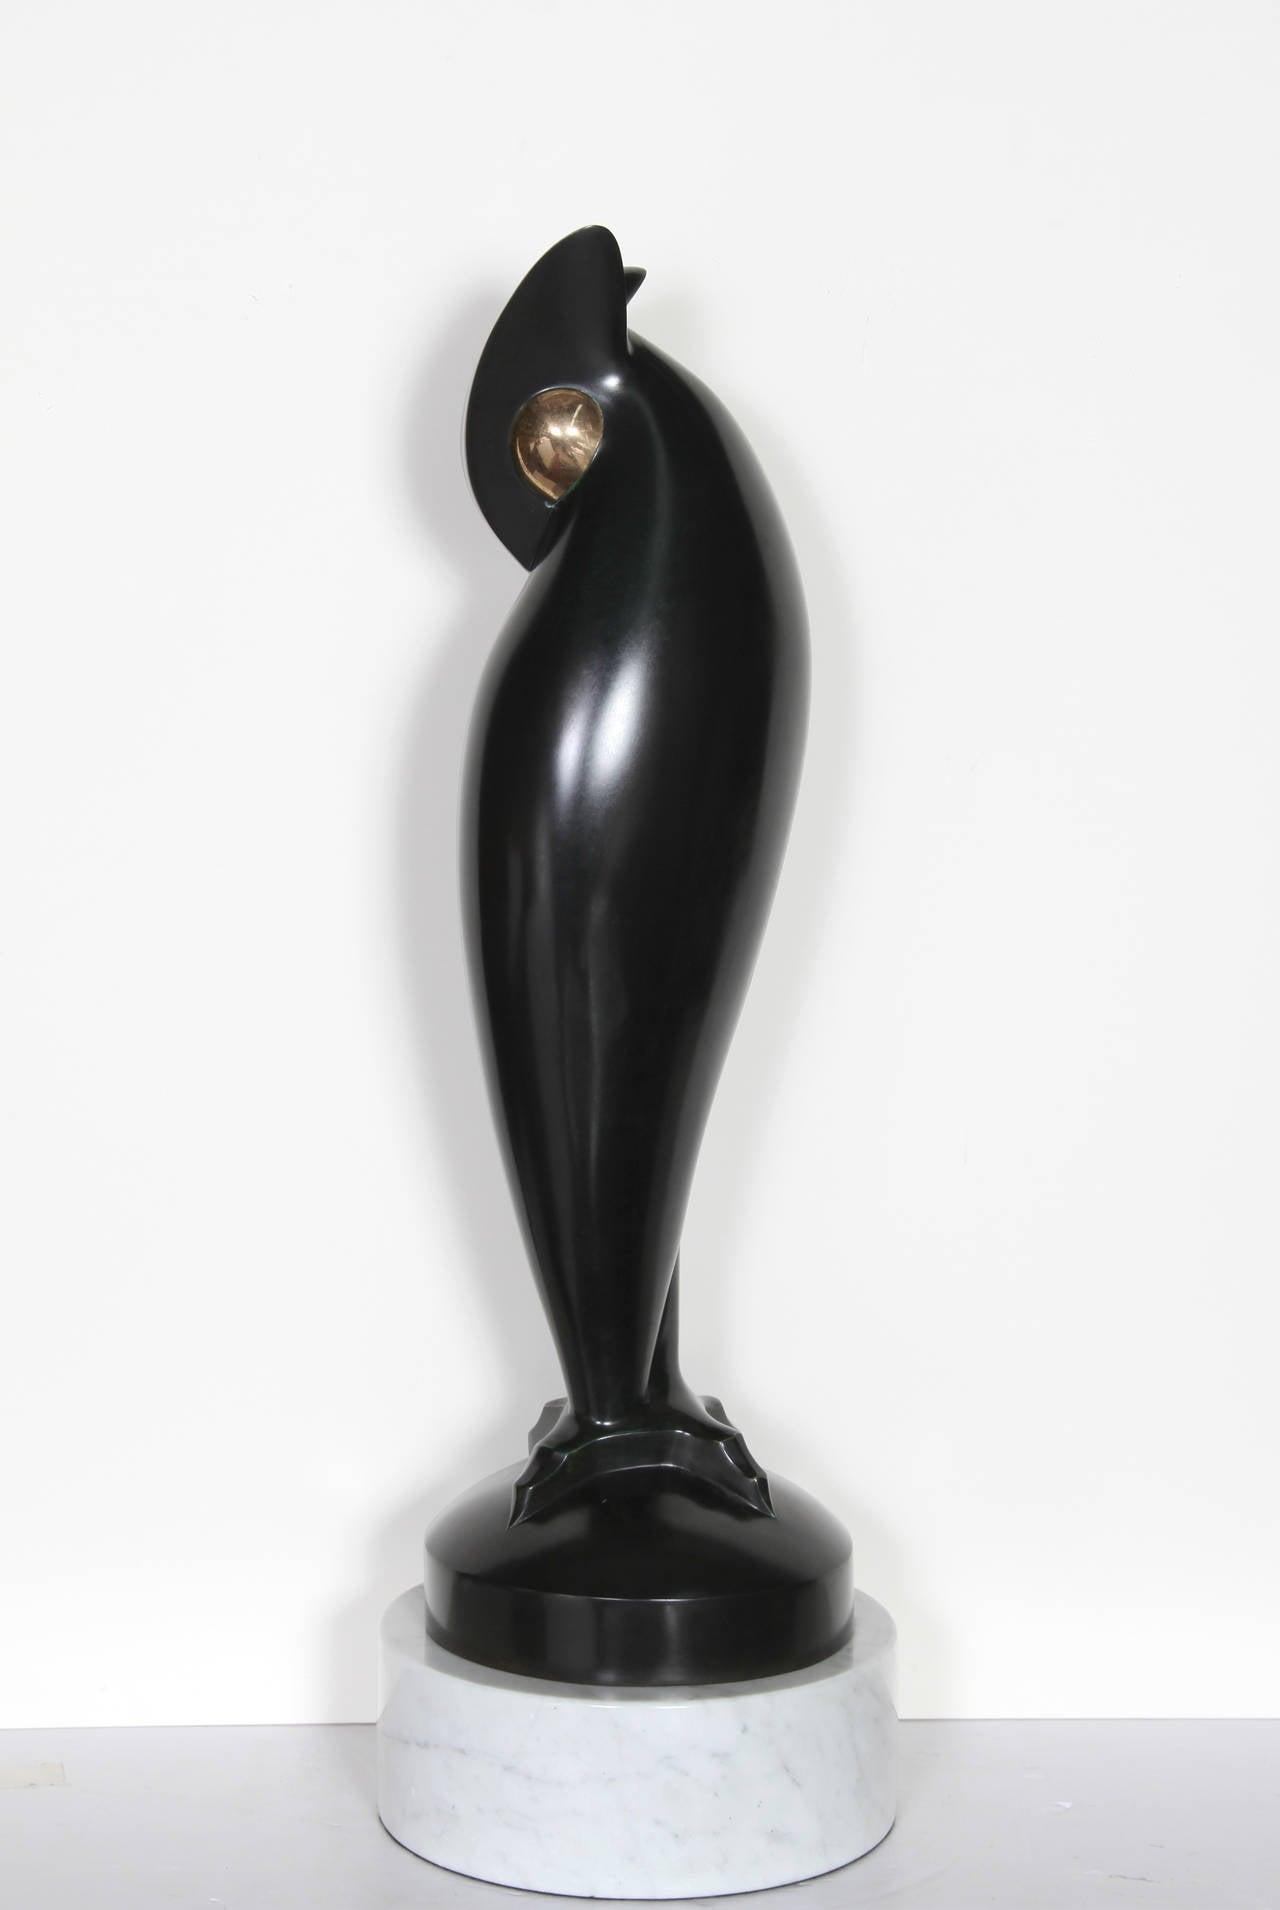 Sleeping Owl, Bronze Sculpture by Antonovici - Brancusi's Protege For Sale 2